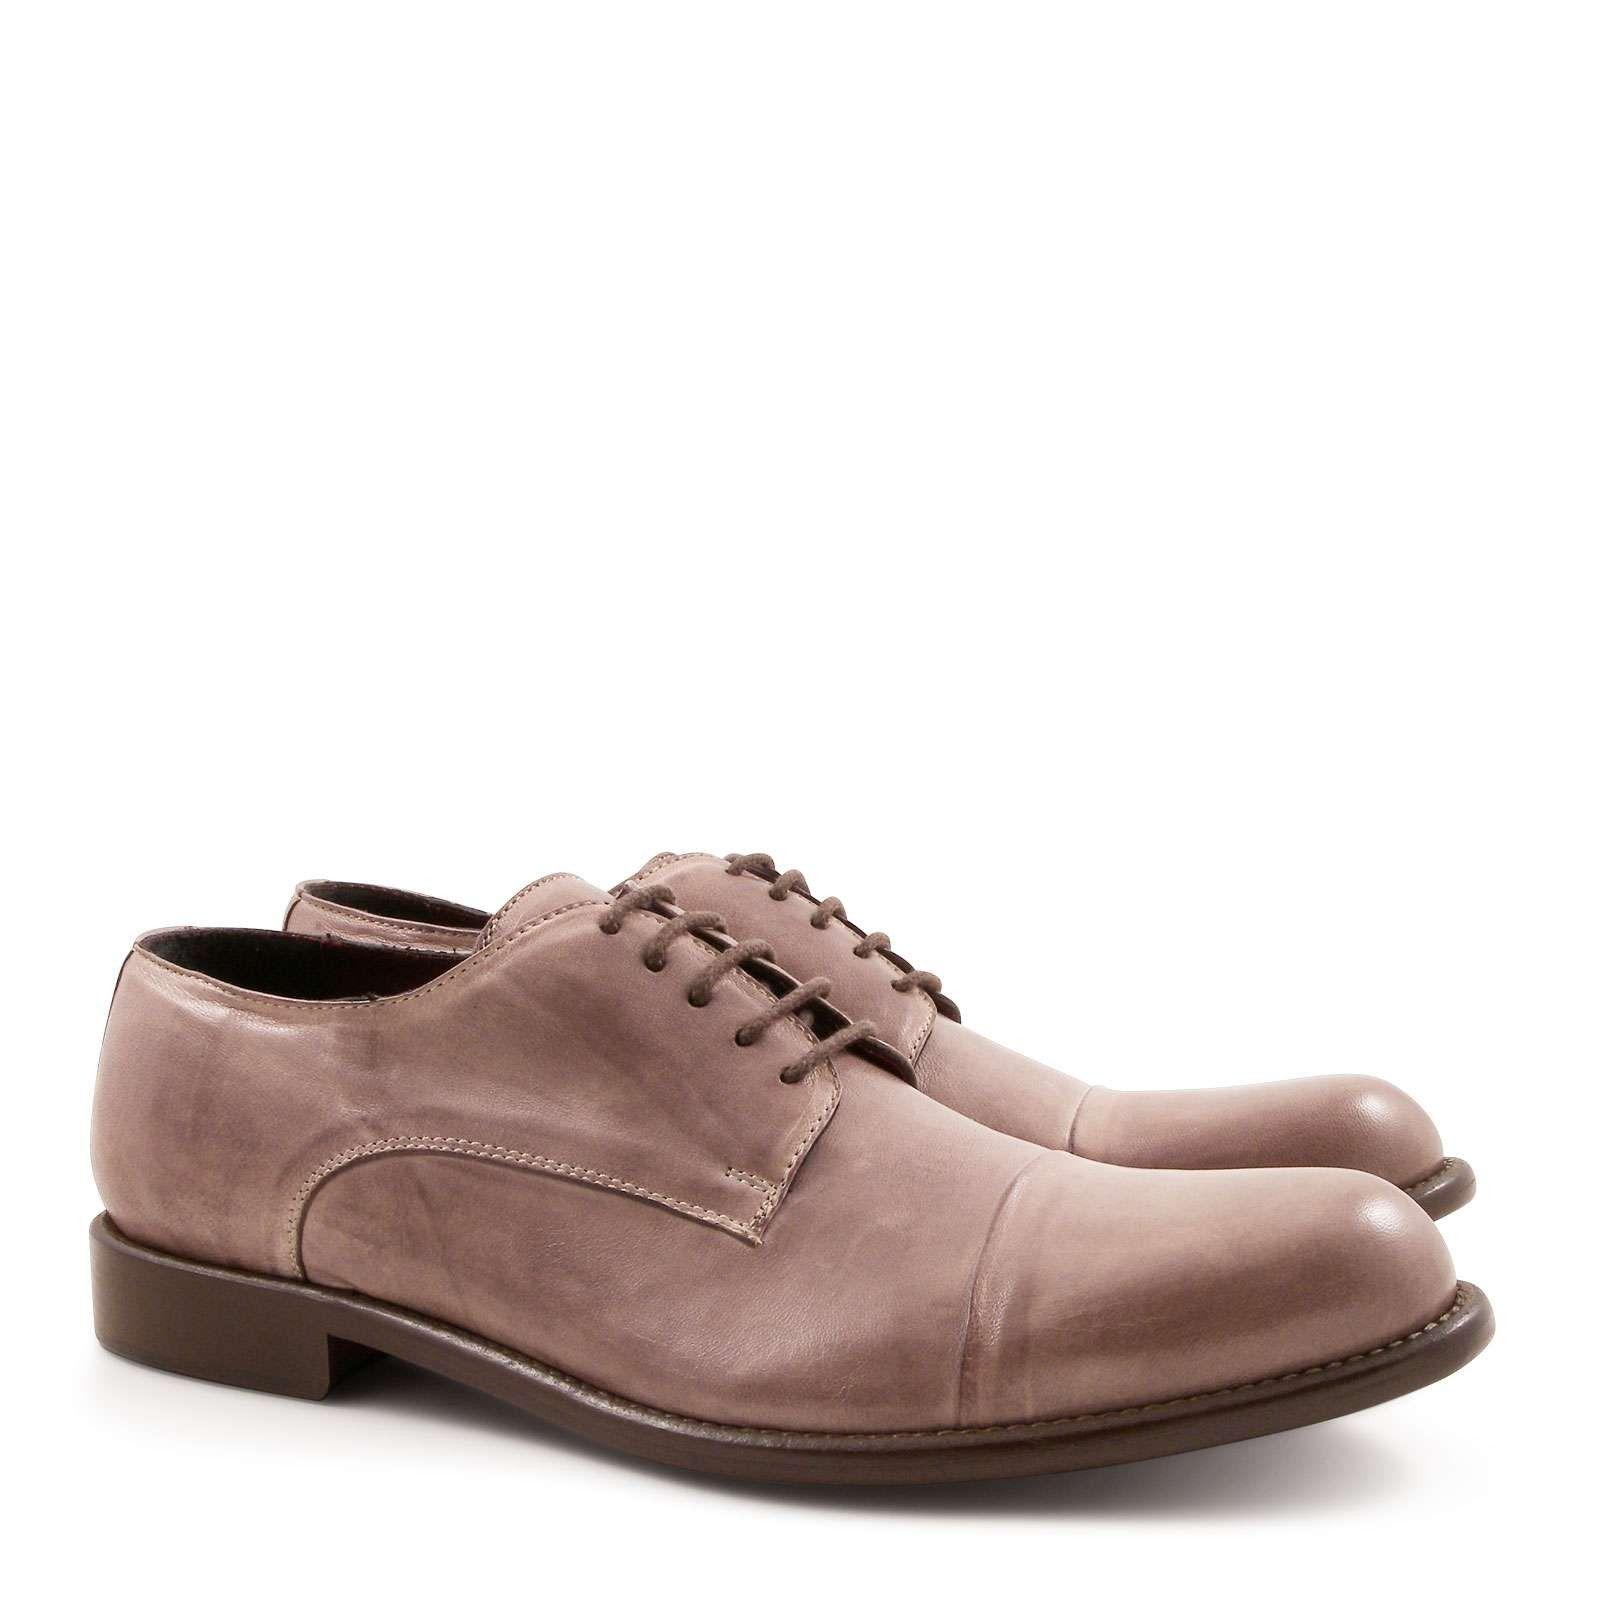 Handmade men's leather derby plain cup toe shoes - Italian Boutique €304